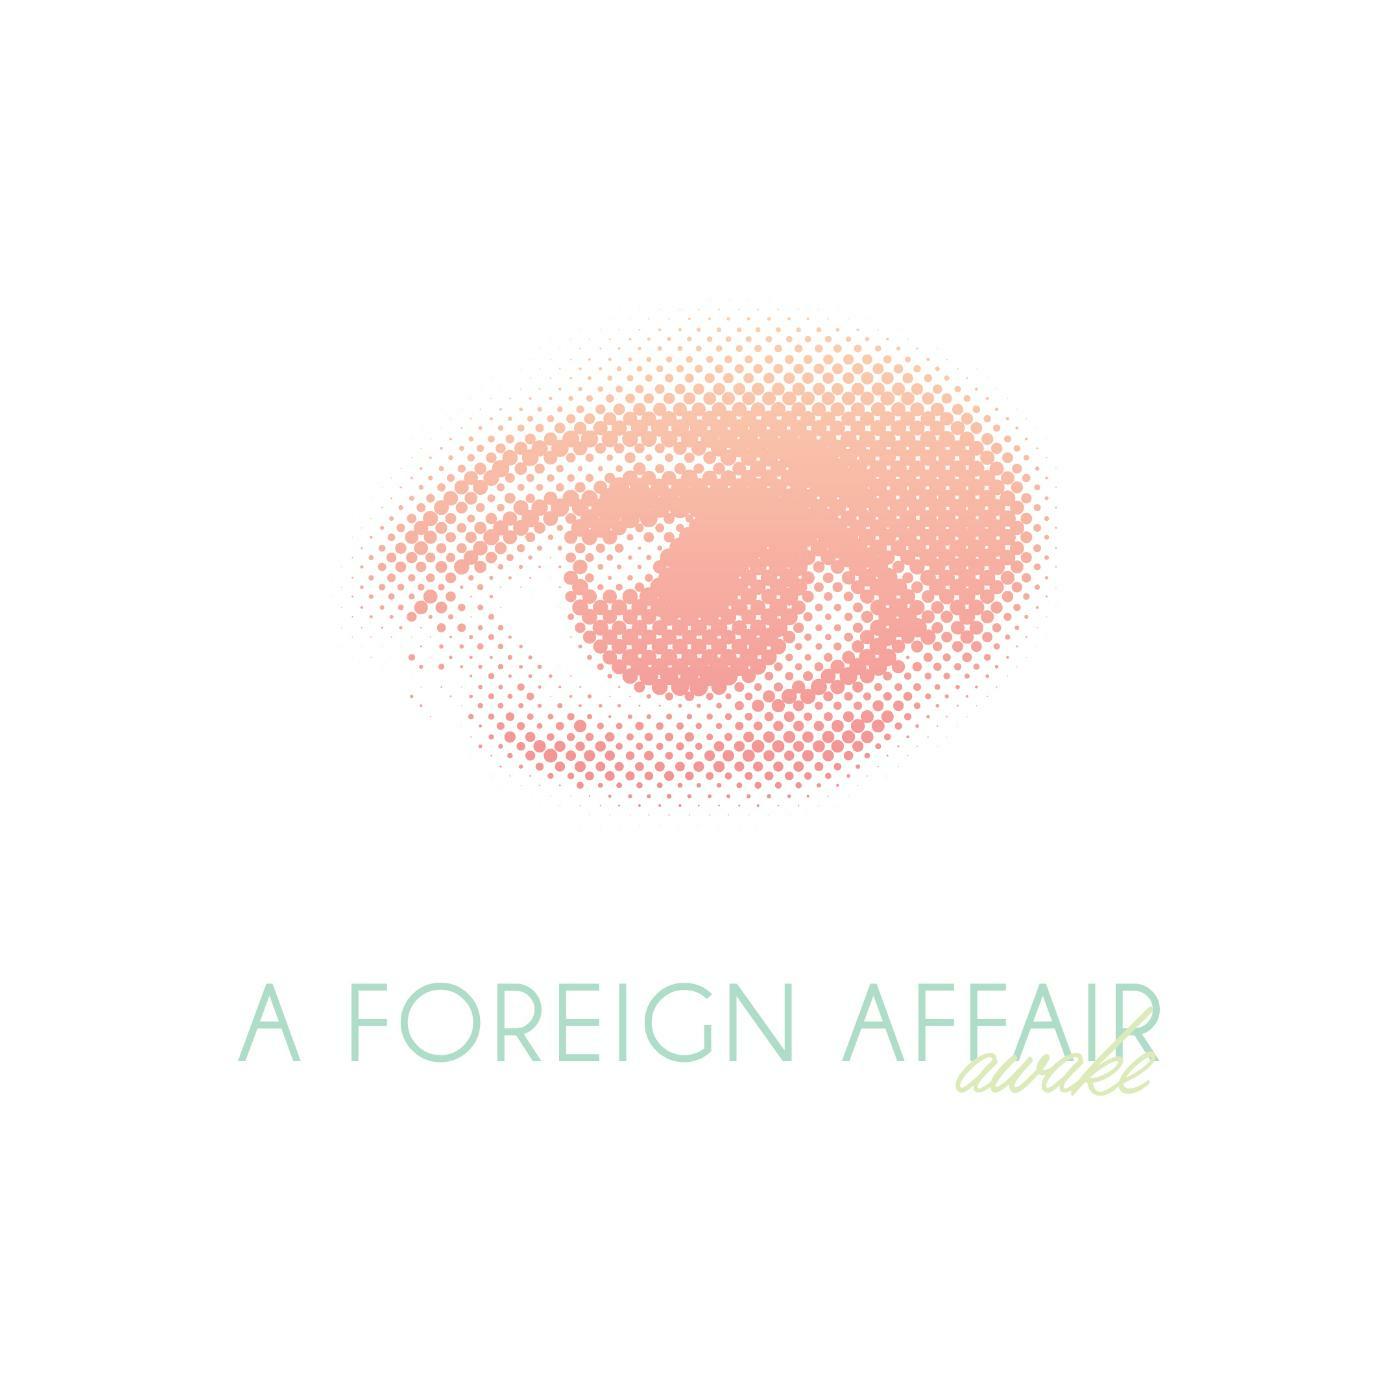 A Foreign Affair - Awake [single] (2016)